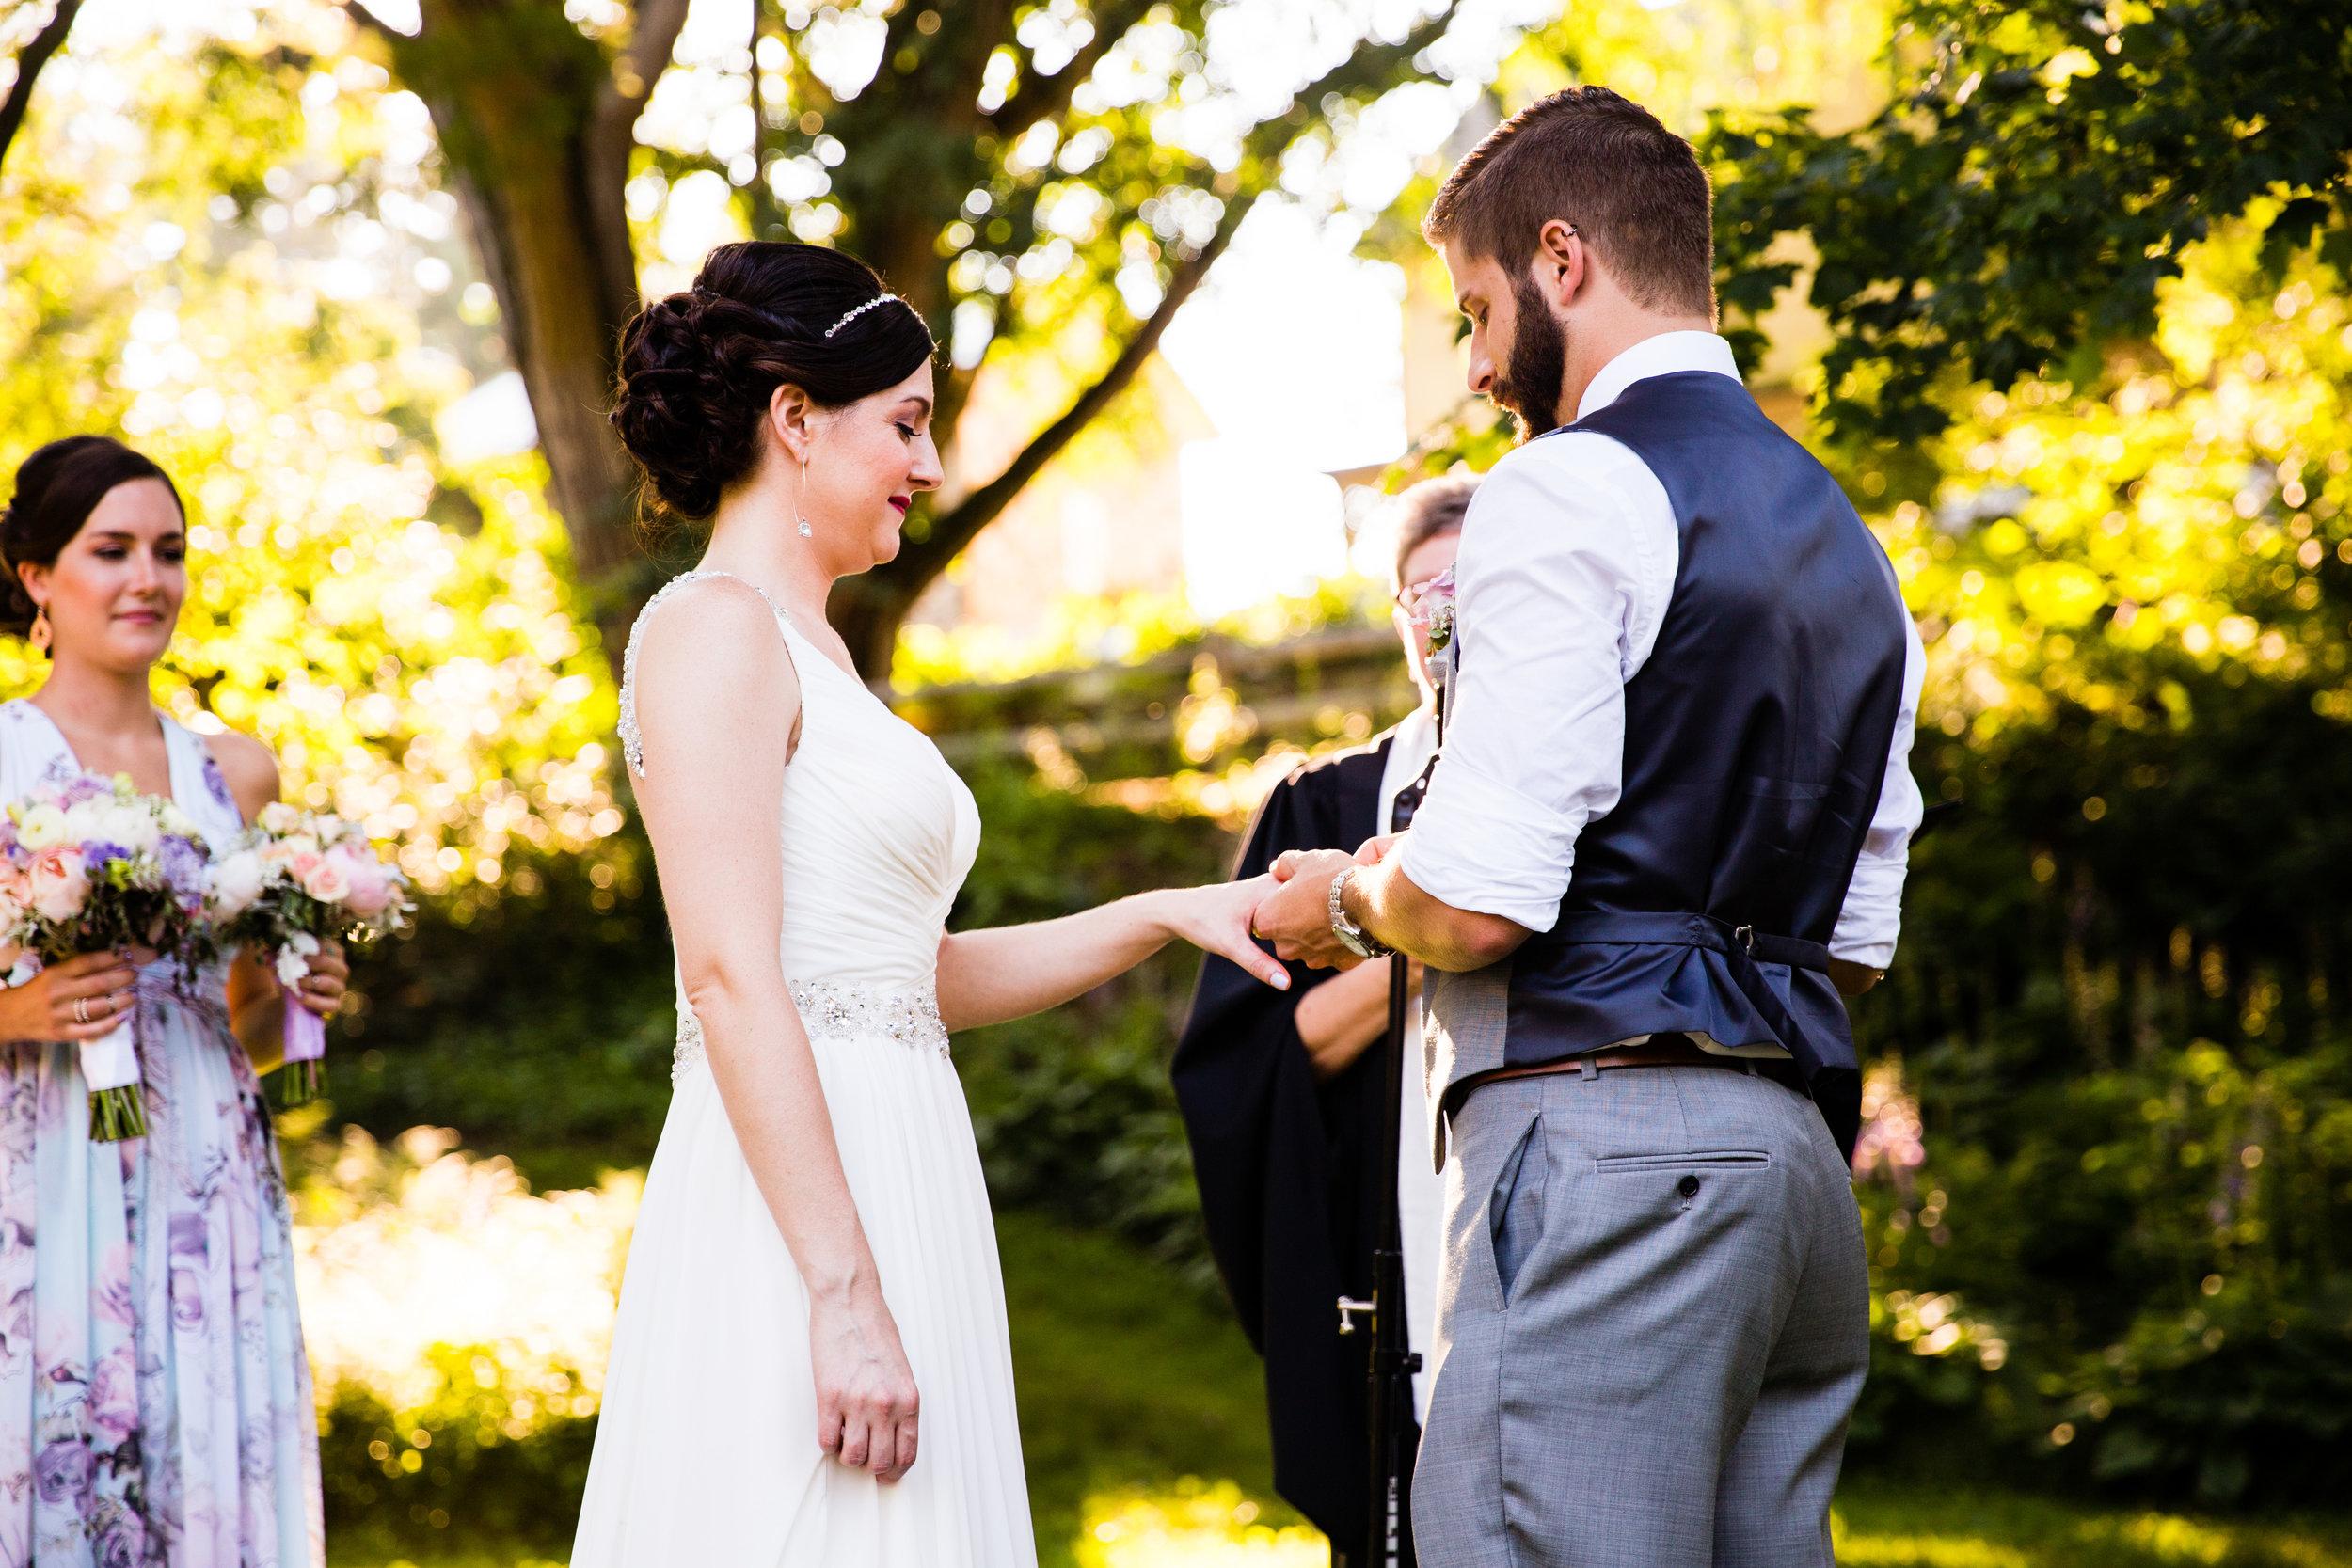 TYLER ARBORETUM WEDDING PHOTOGRAPHY LOVESTRUCK PICTURES-058.jpg